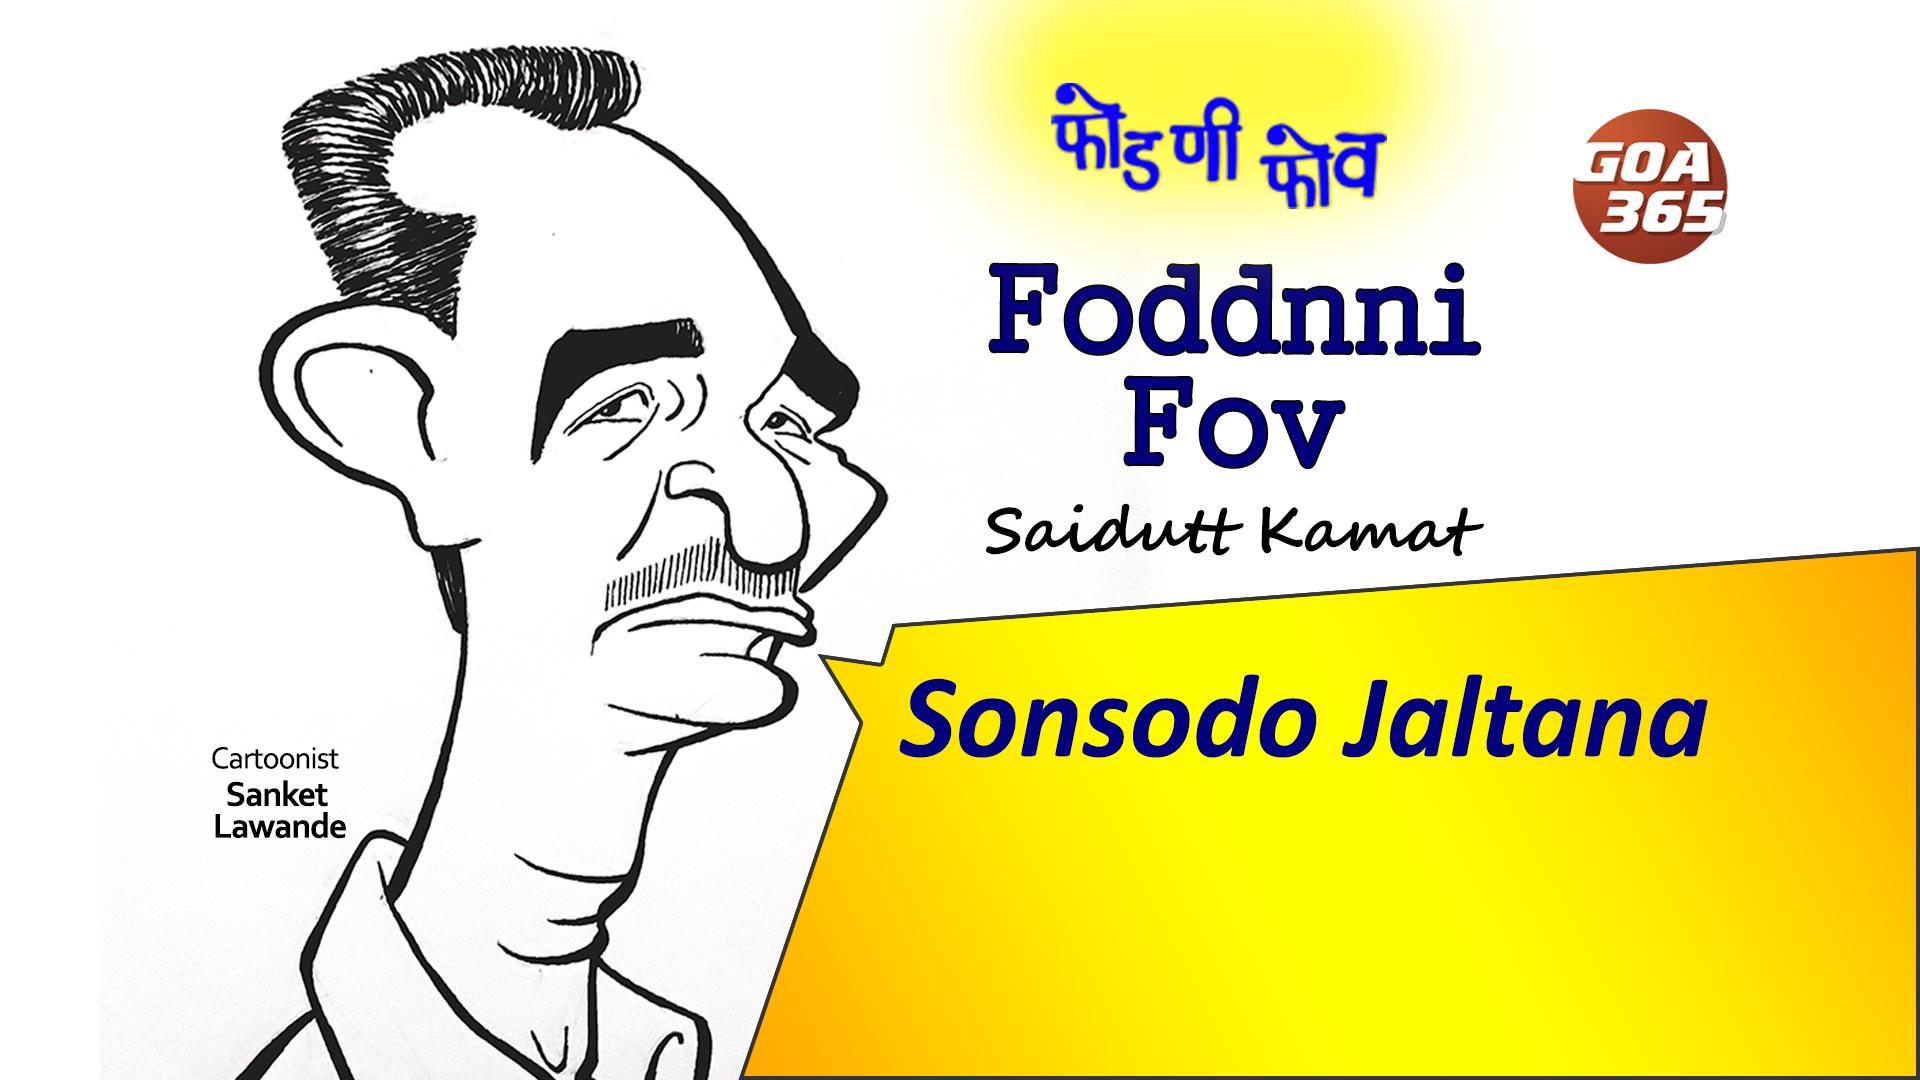 #FODDNNI_FOV : Sonsodo Jaltana